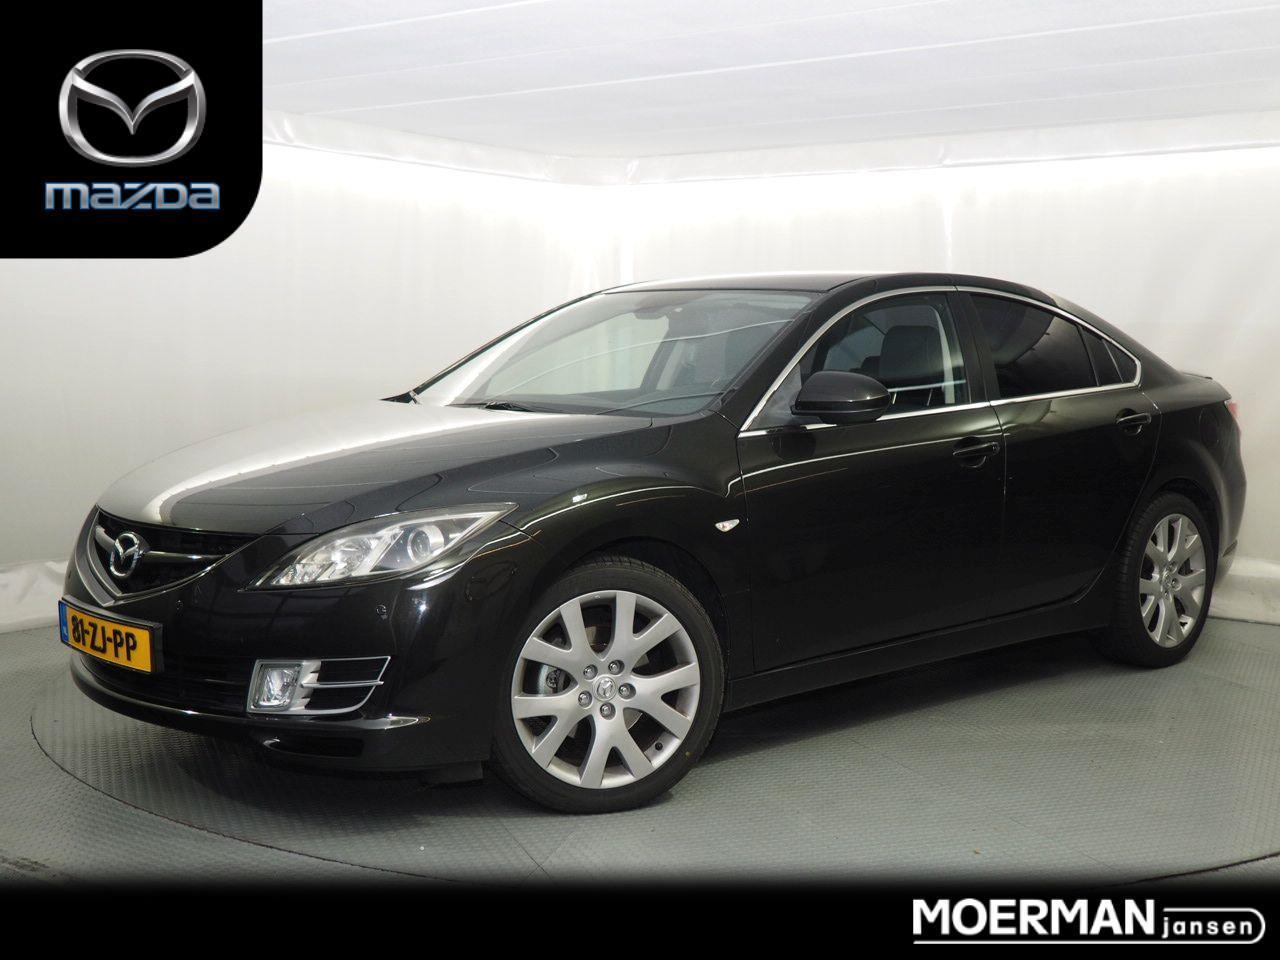 Mazda 6 2.0 automaat / sedan / dealer onderhouden / trekhaak / nl auto / climate-& cruise control